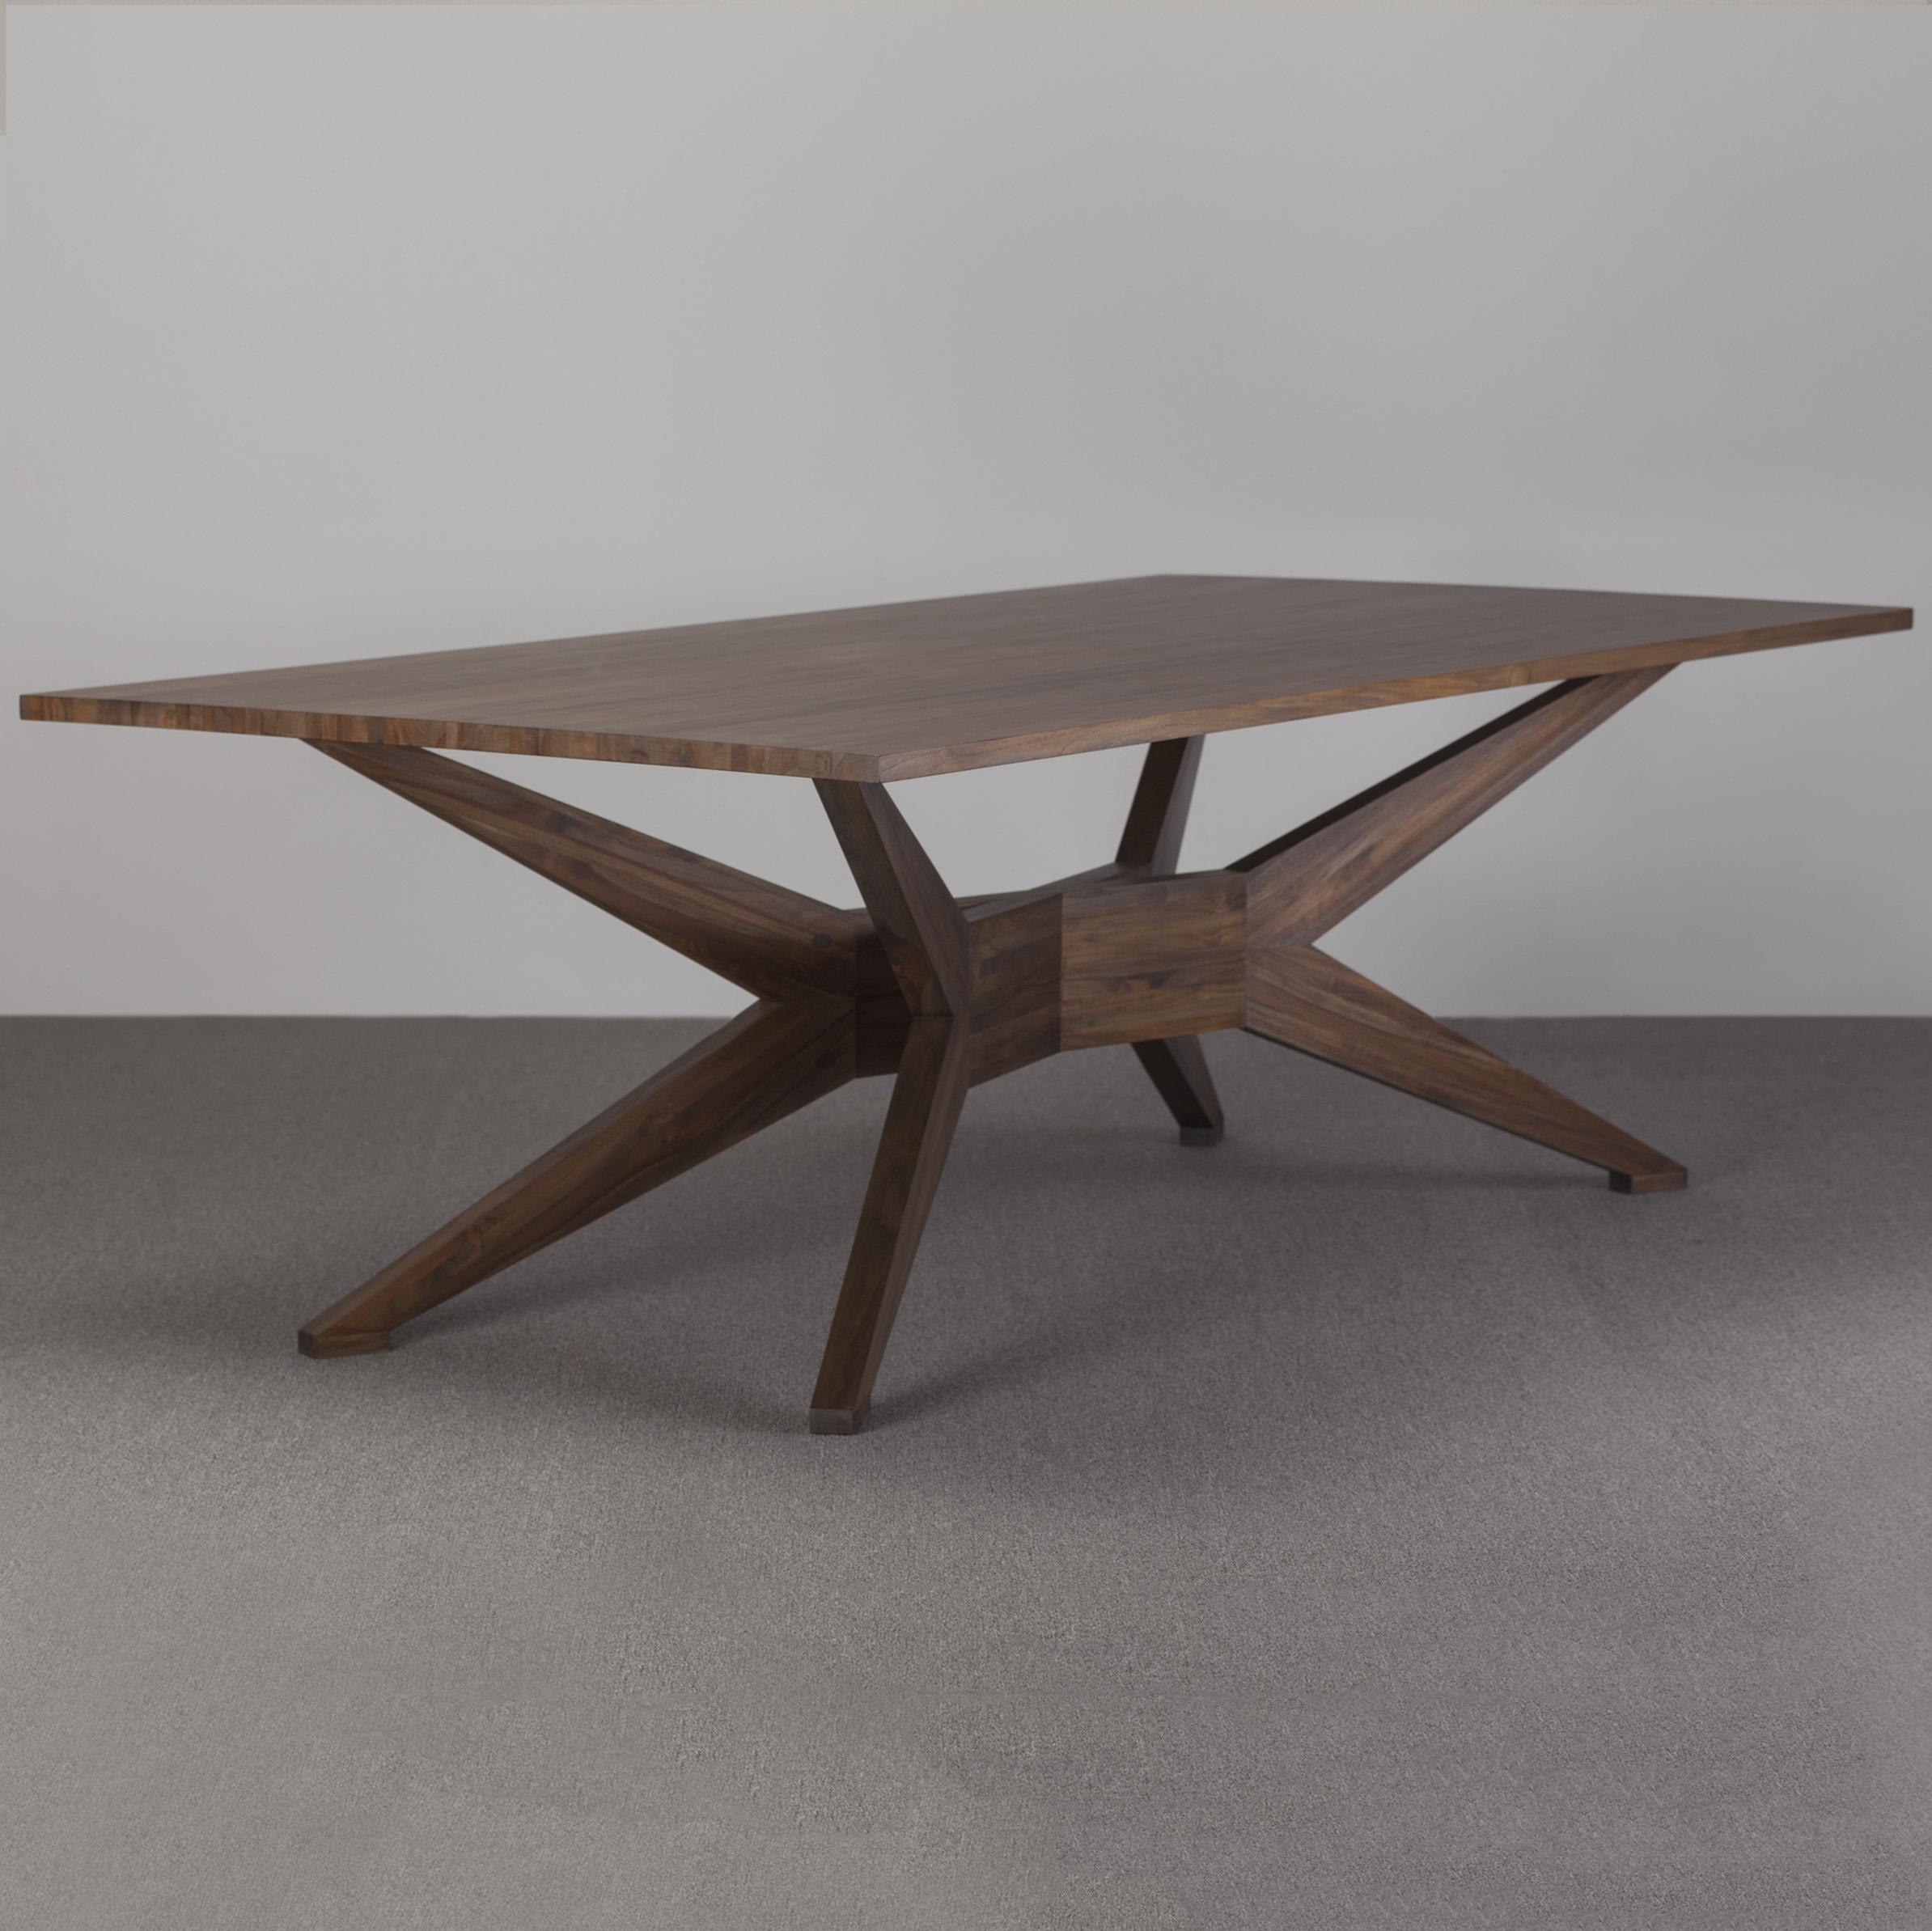 basis-dining-table-1.jpg